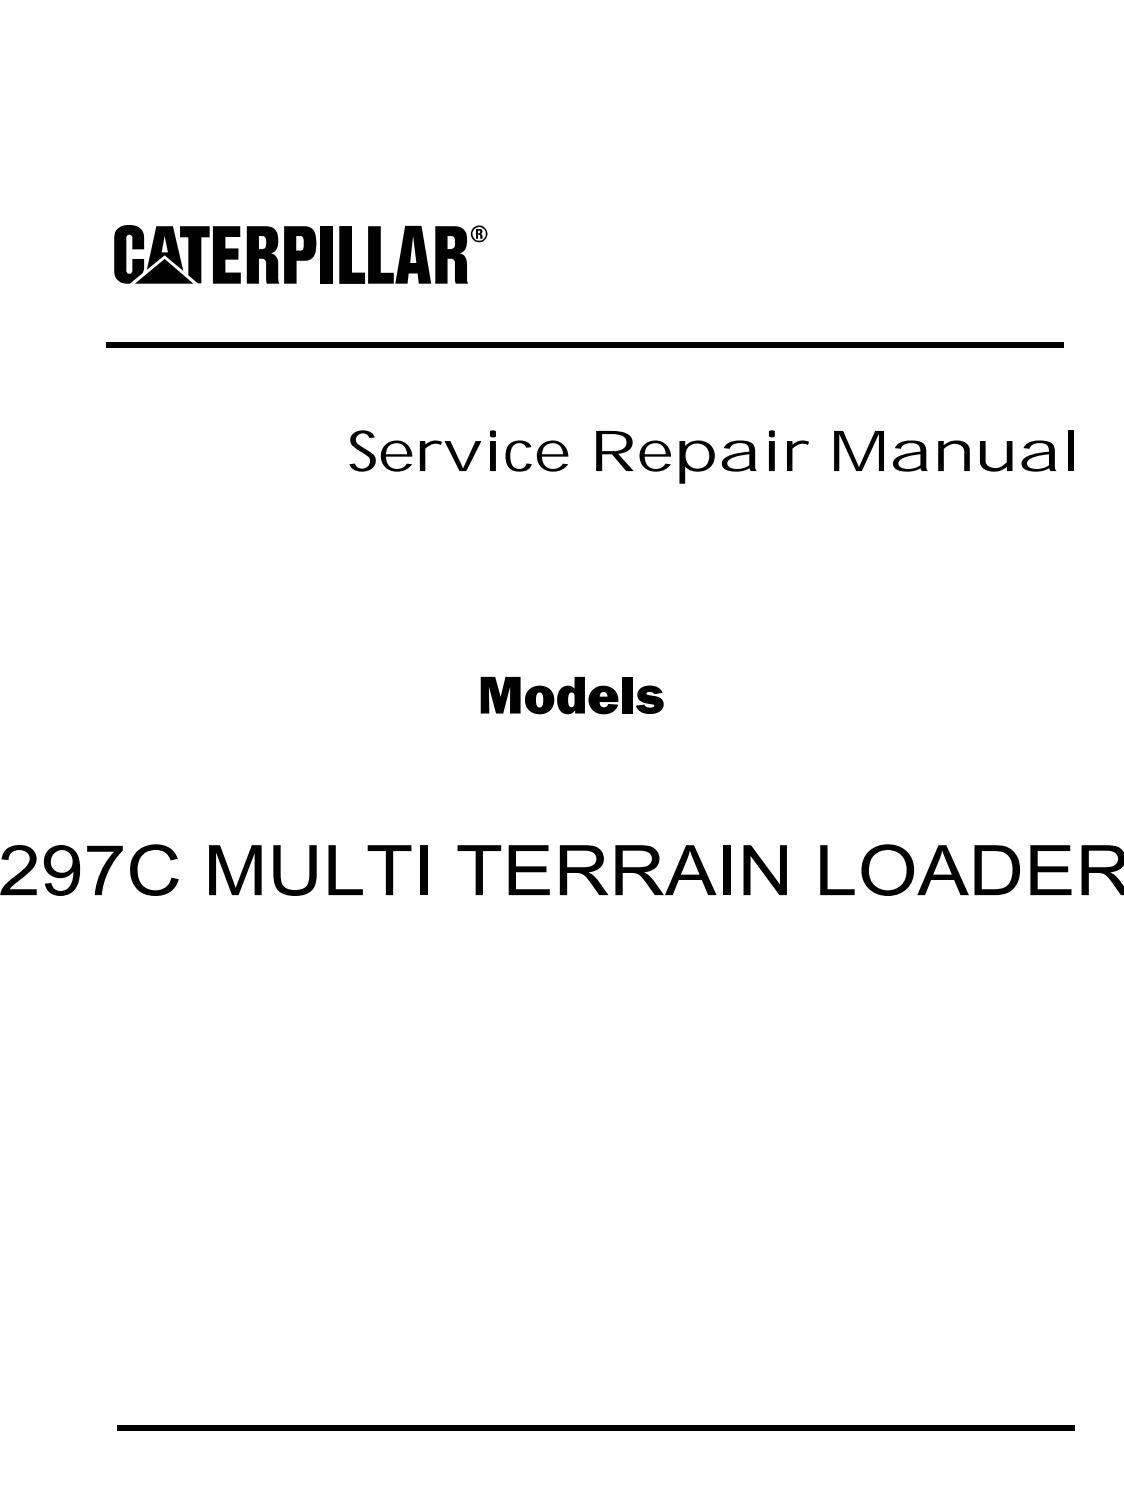 Caterpillar Cat 297C MULTI TERRAIN LOADER (Prefix GCP